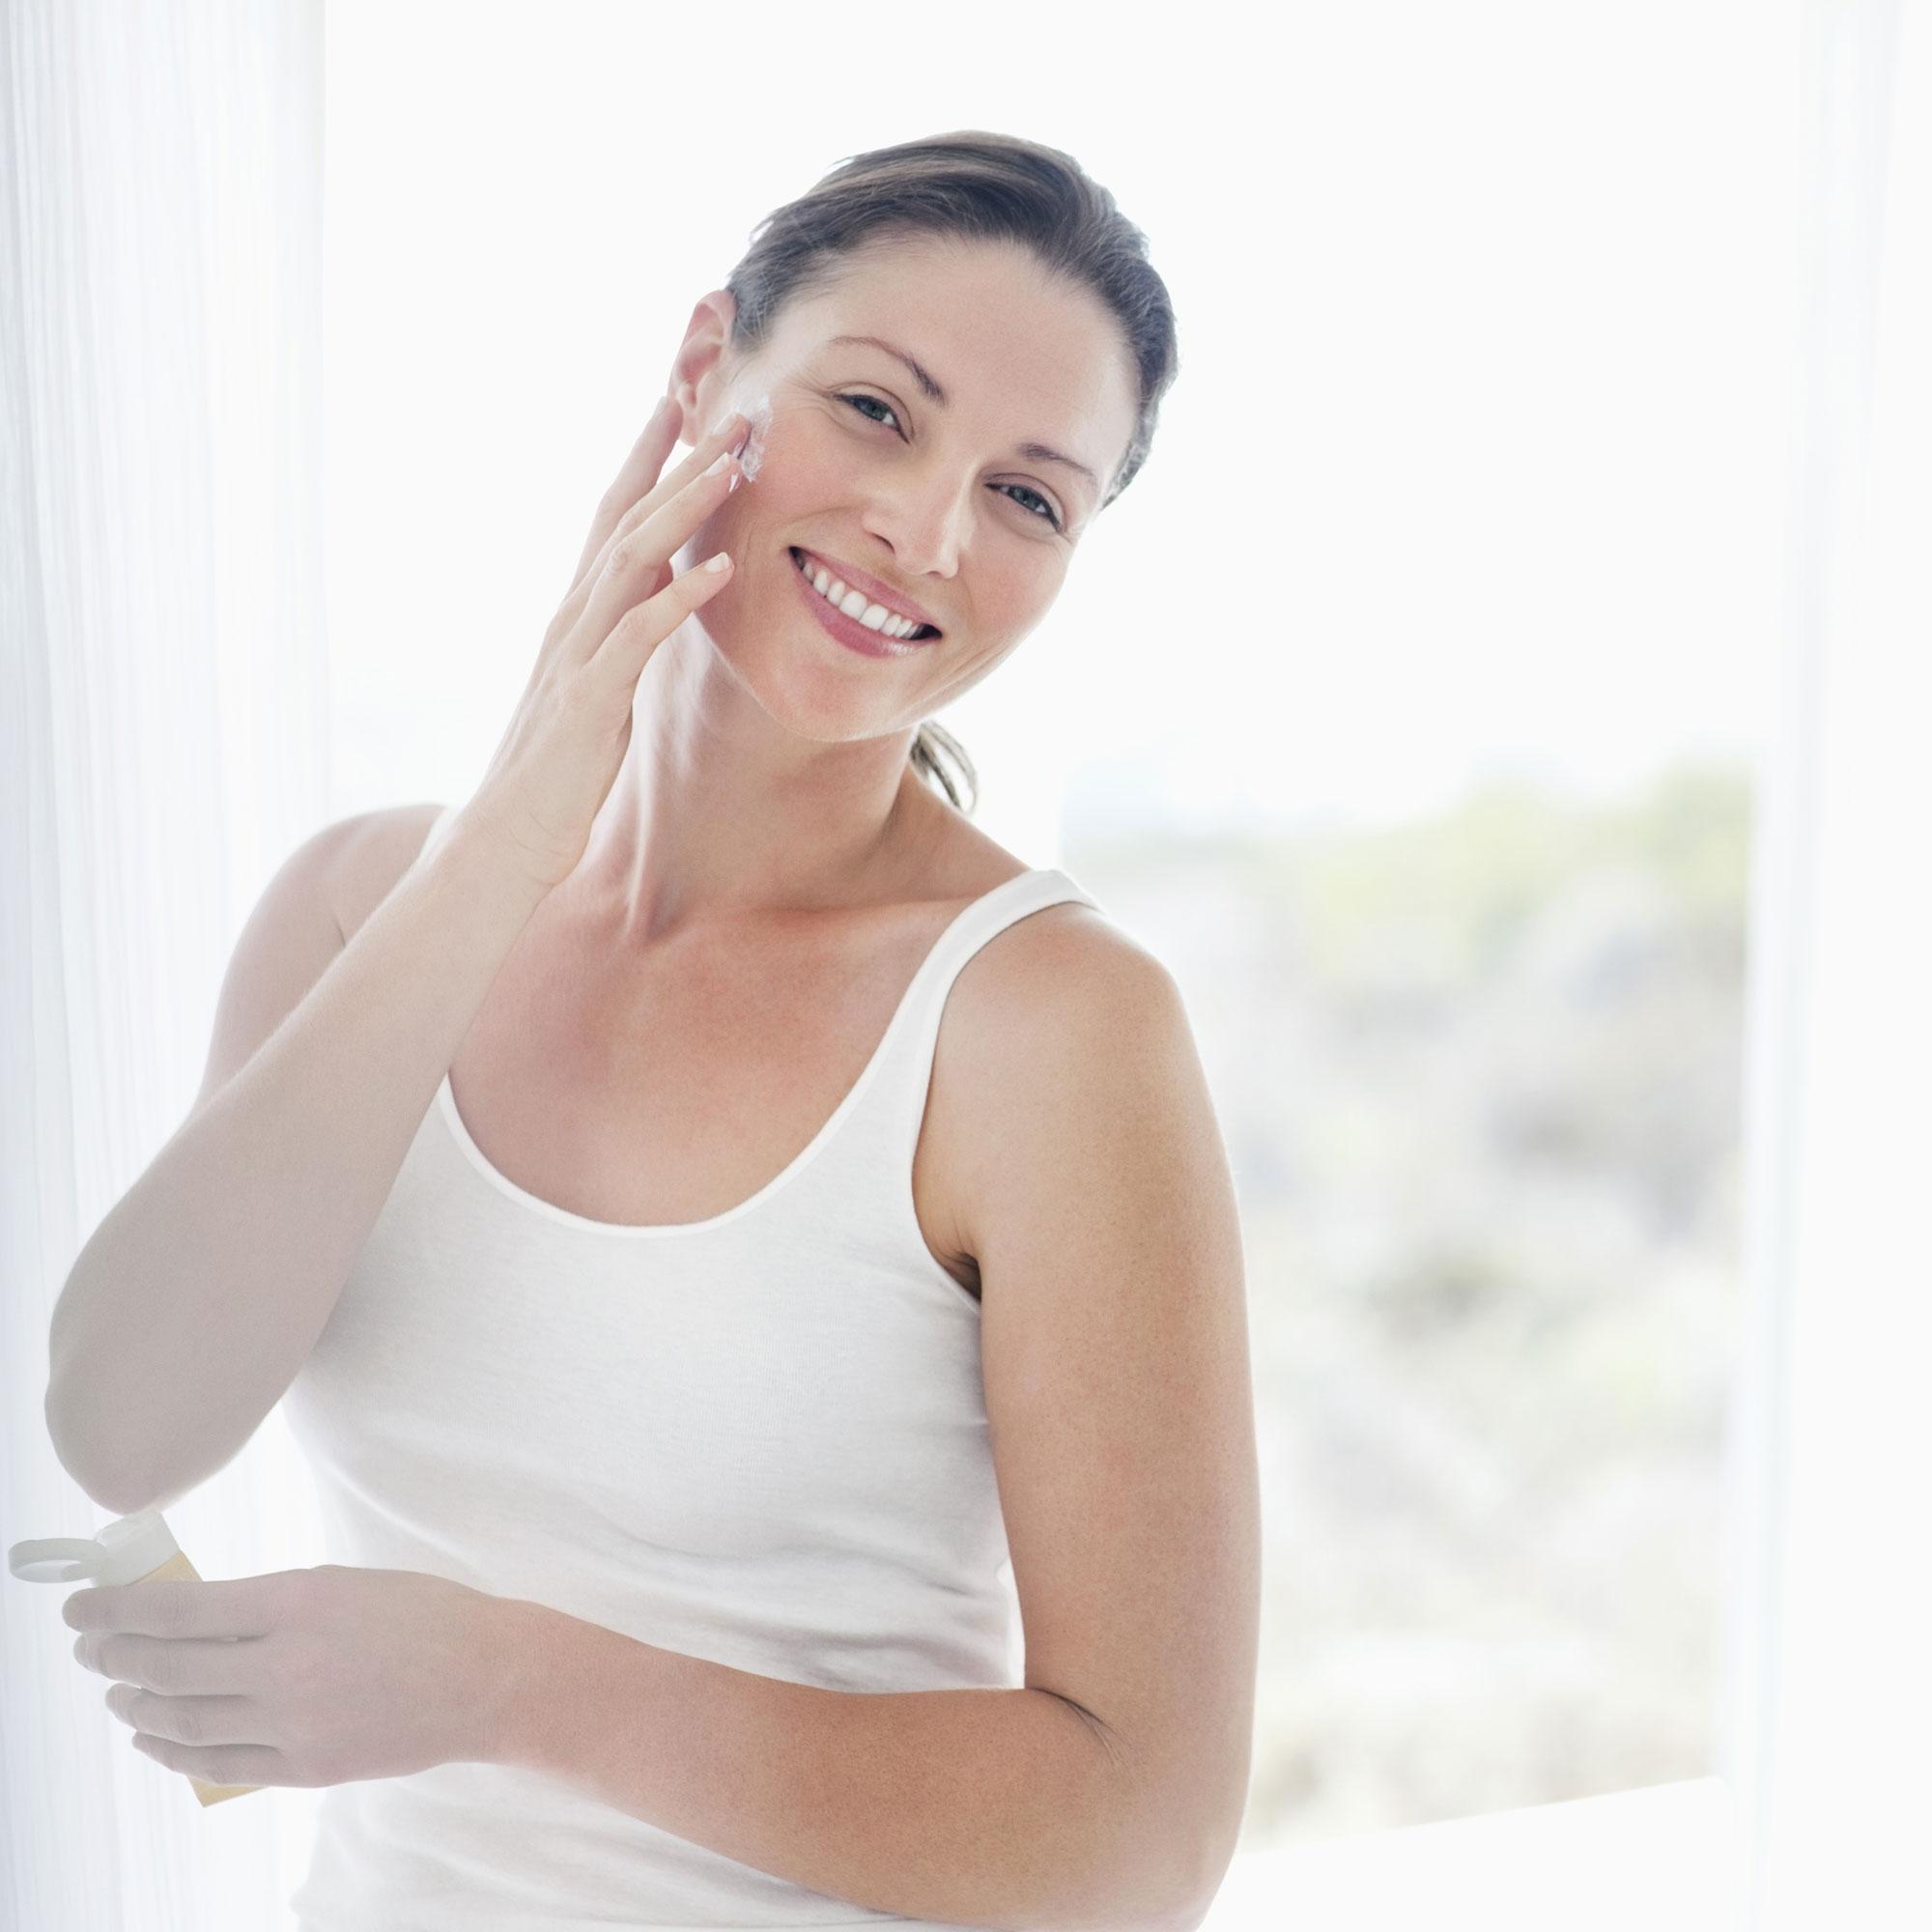 woman applying moisturiser photo